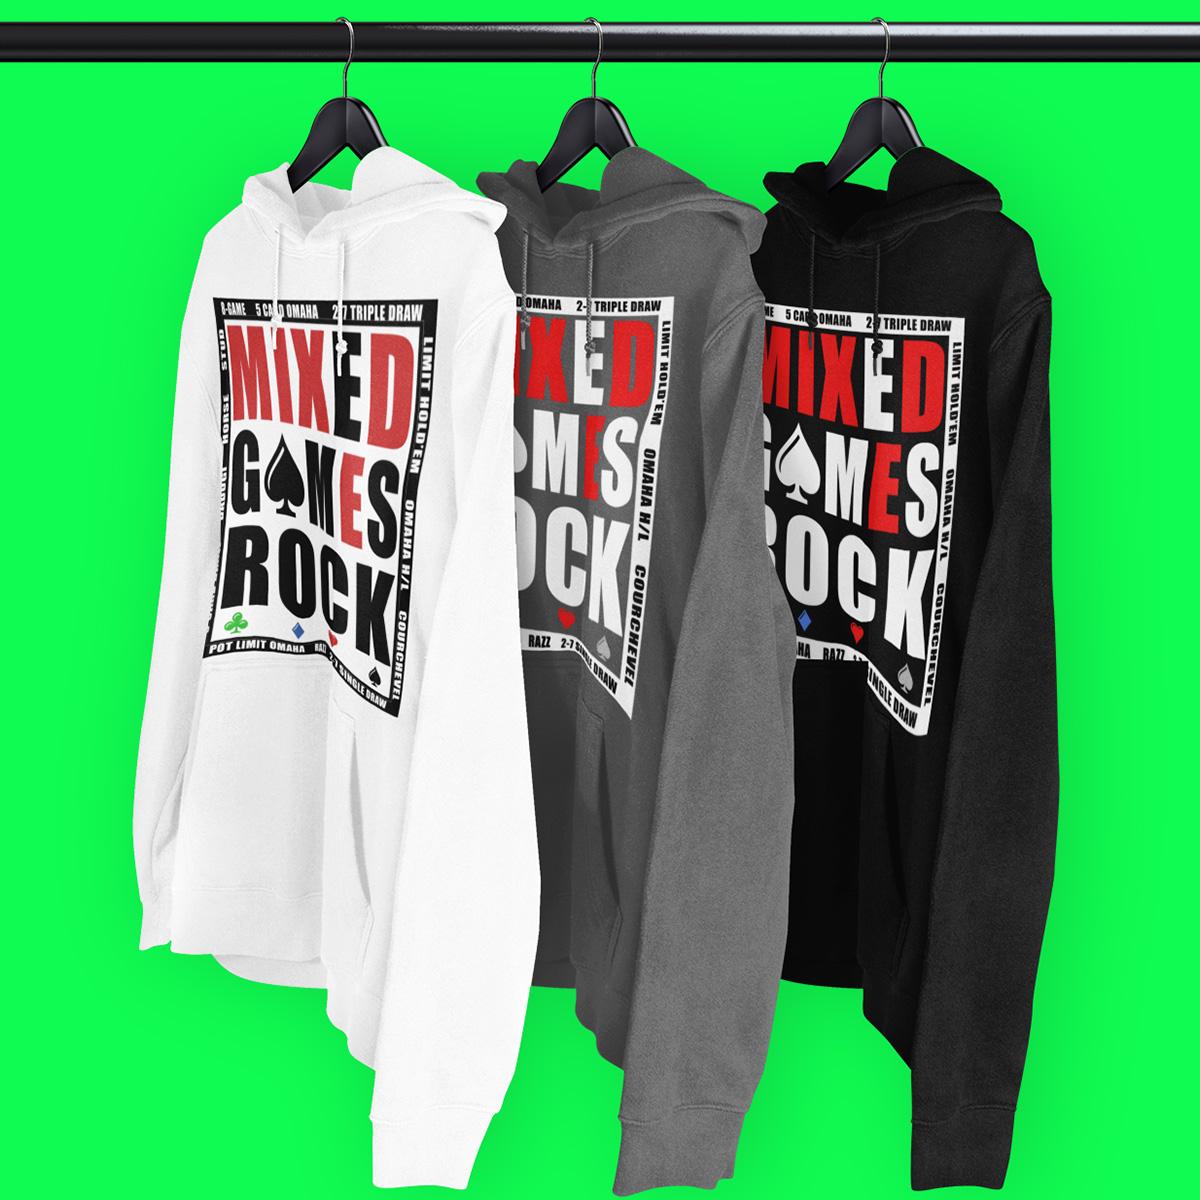 Mixed Games Rock Poker Hoodie